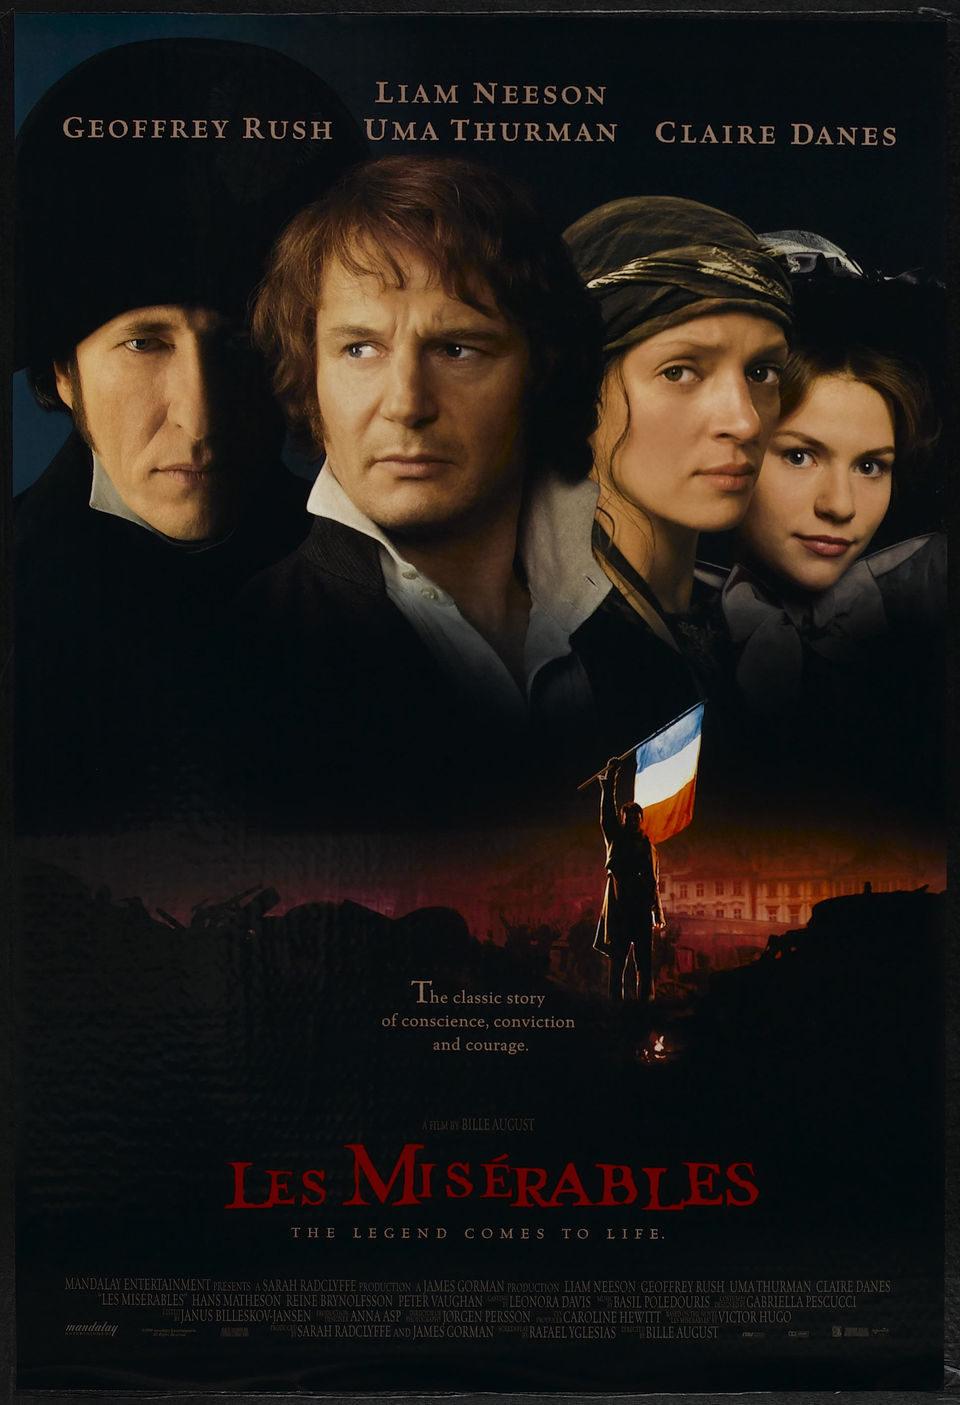 EEUU poster for Les Misérables